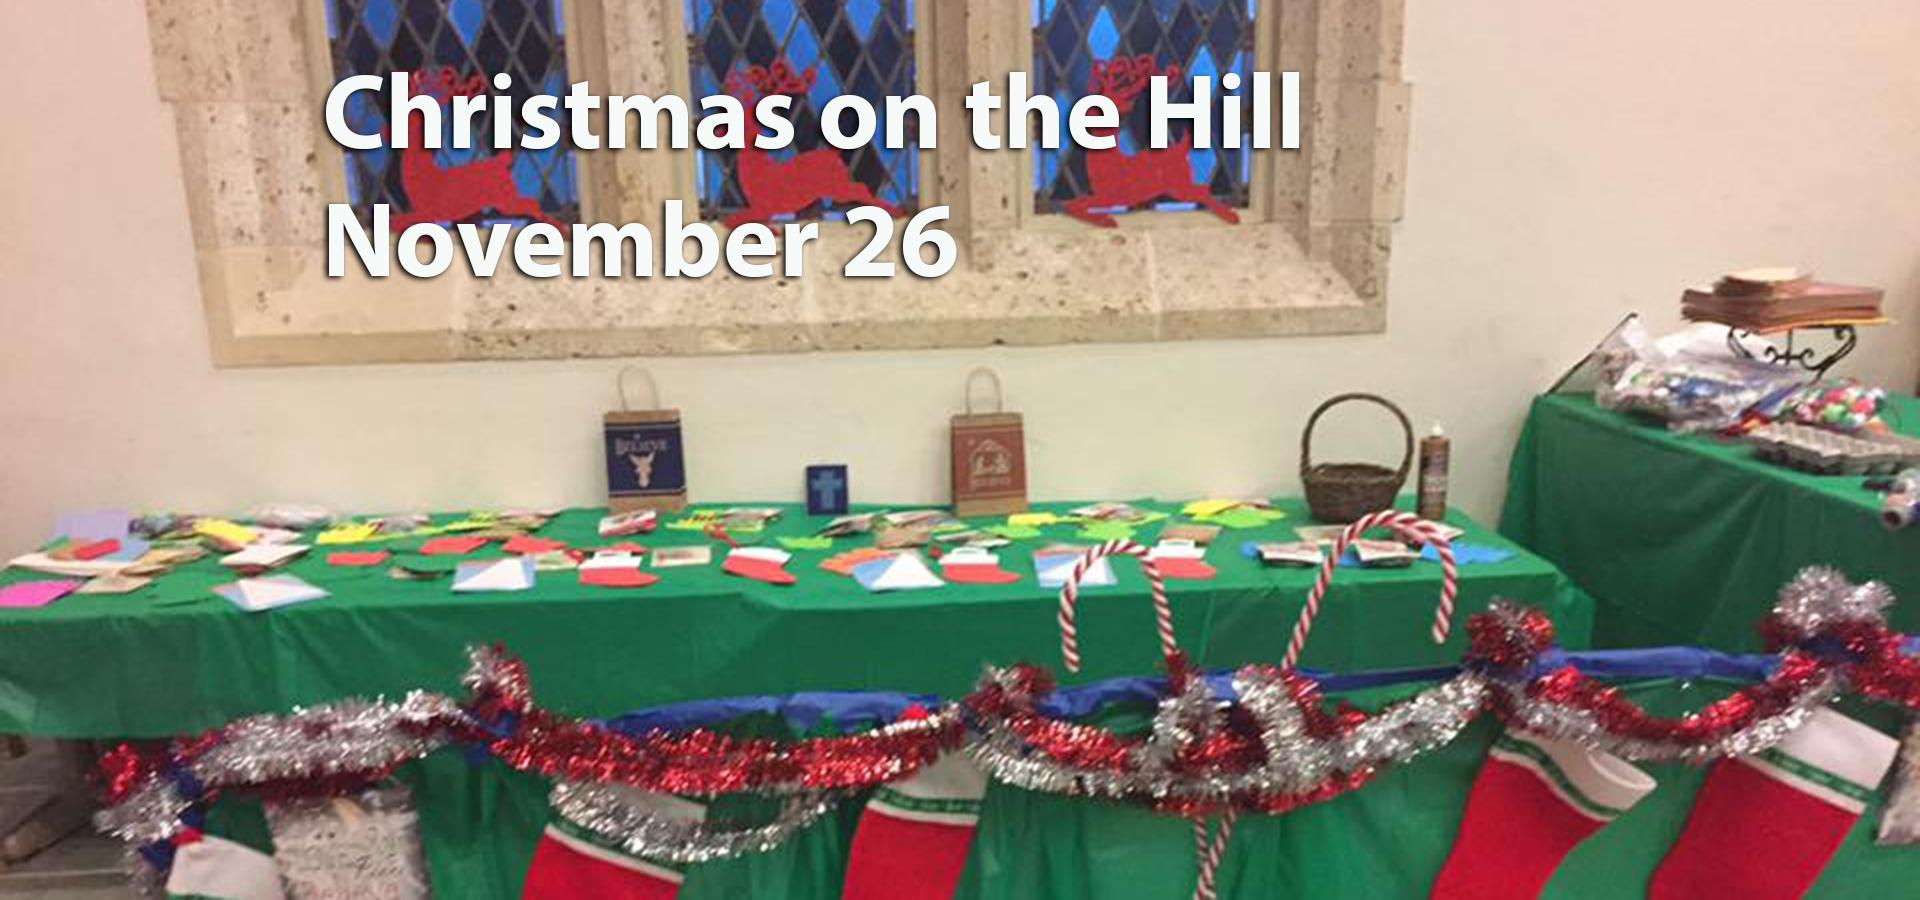 Christmas-on-hill-2017